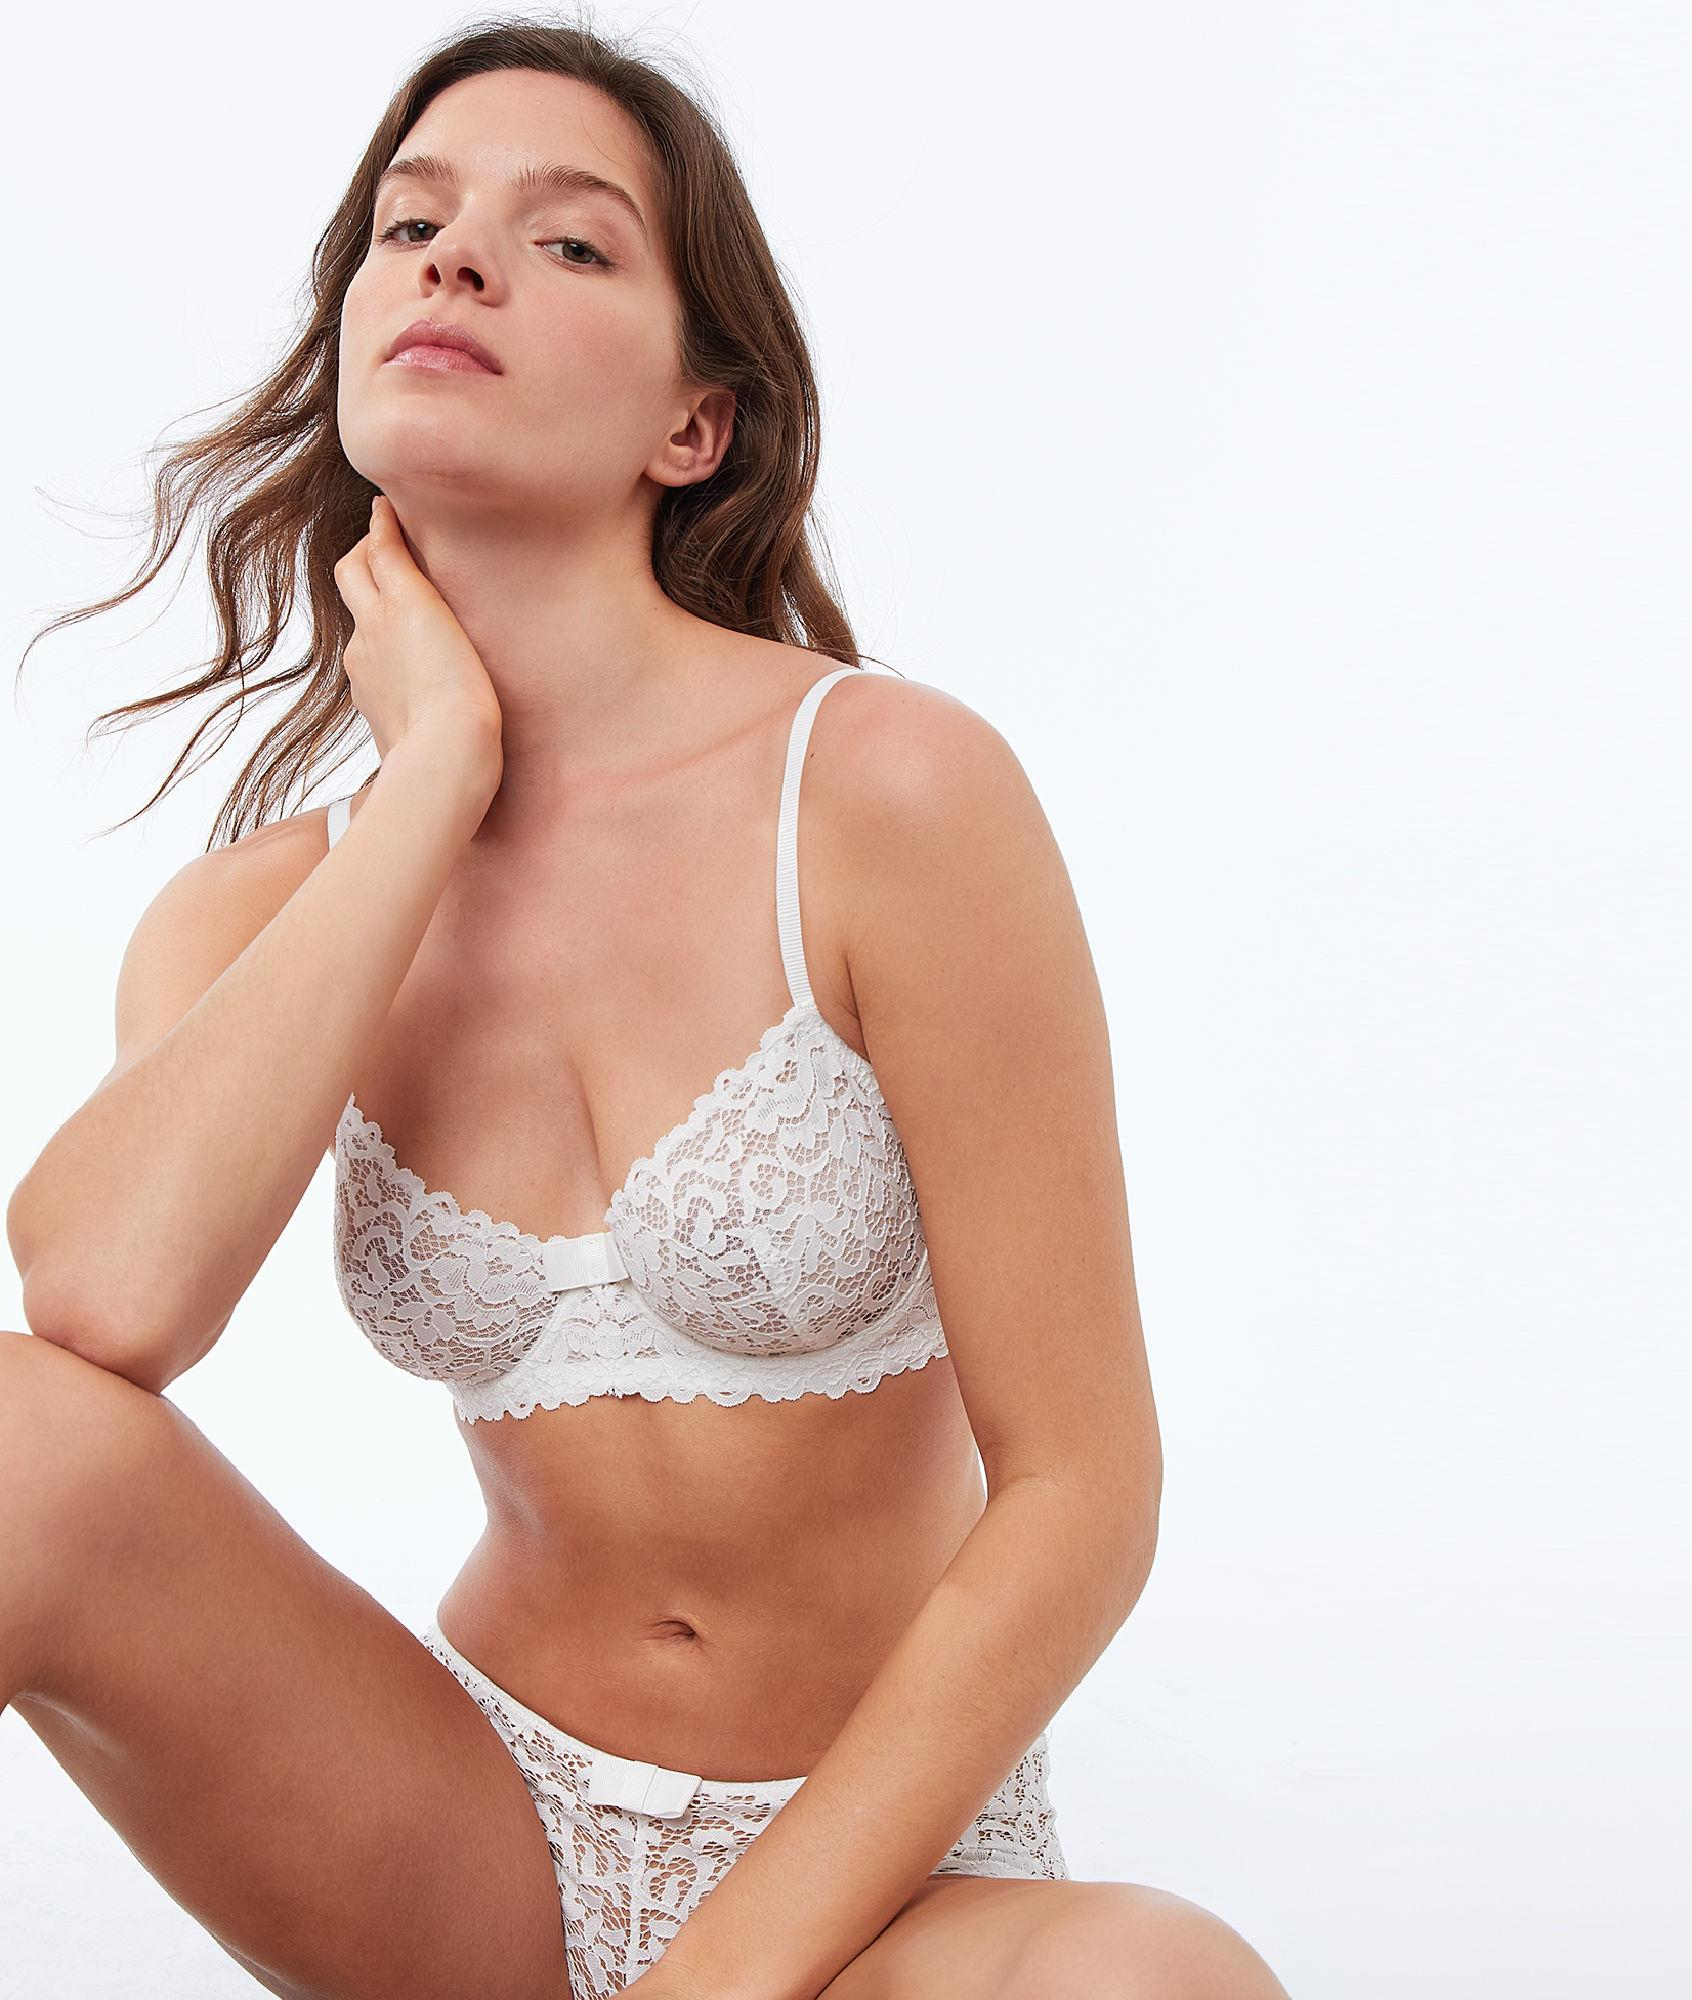 a33cceb144bb Lenceria mujer: que lenceria usar segun tu cuerpo, sujetador, bragas ...